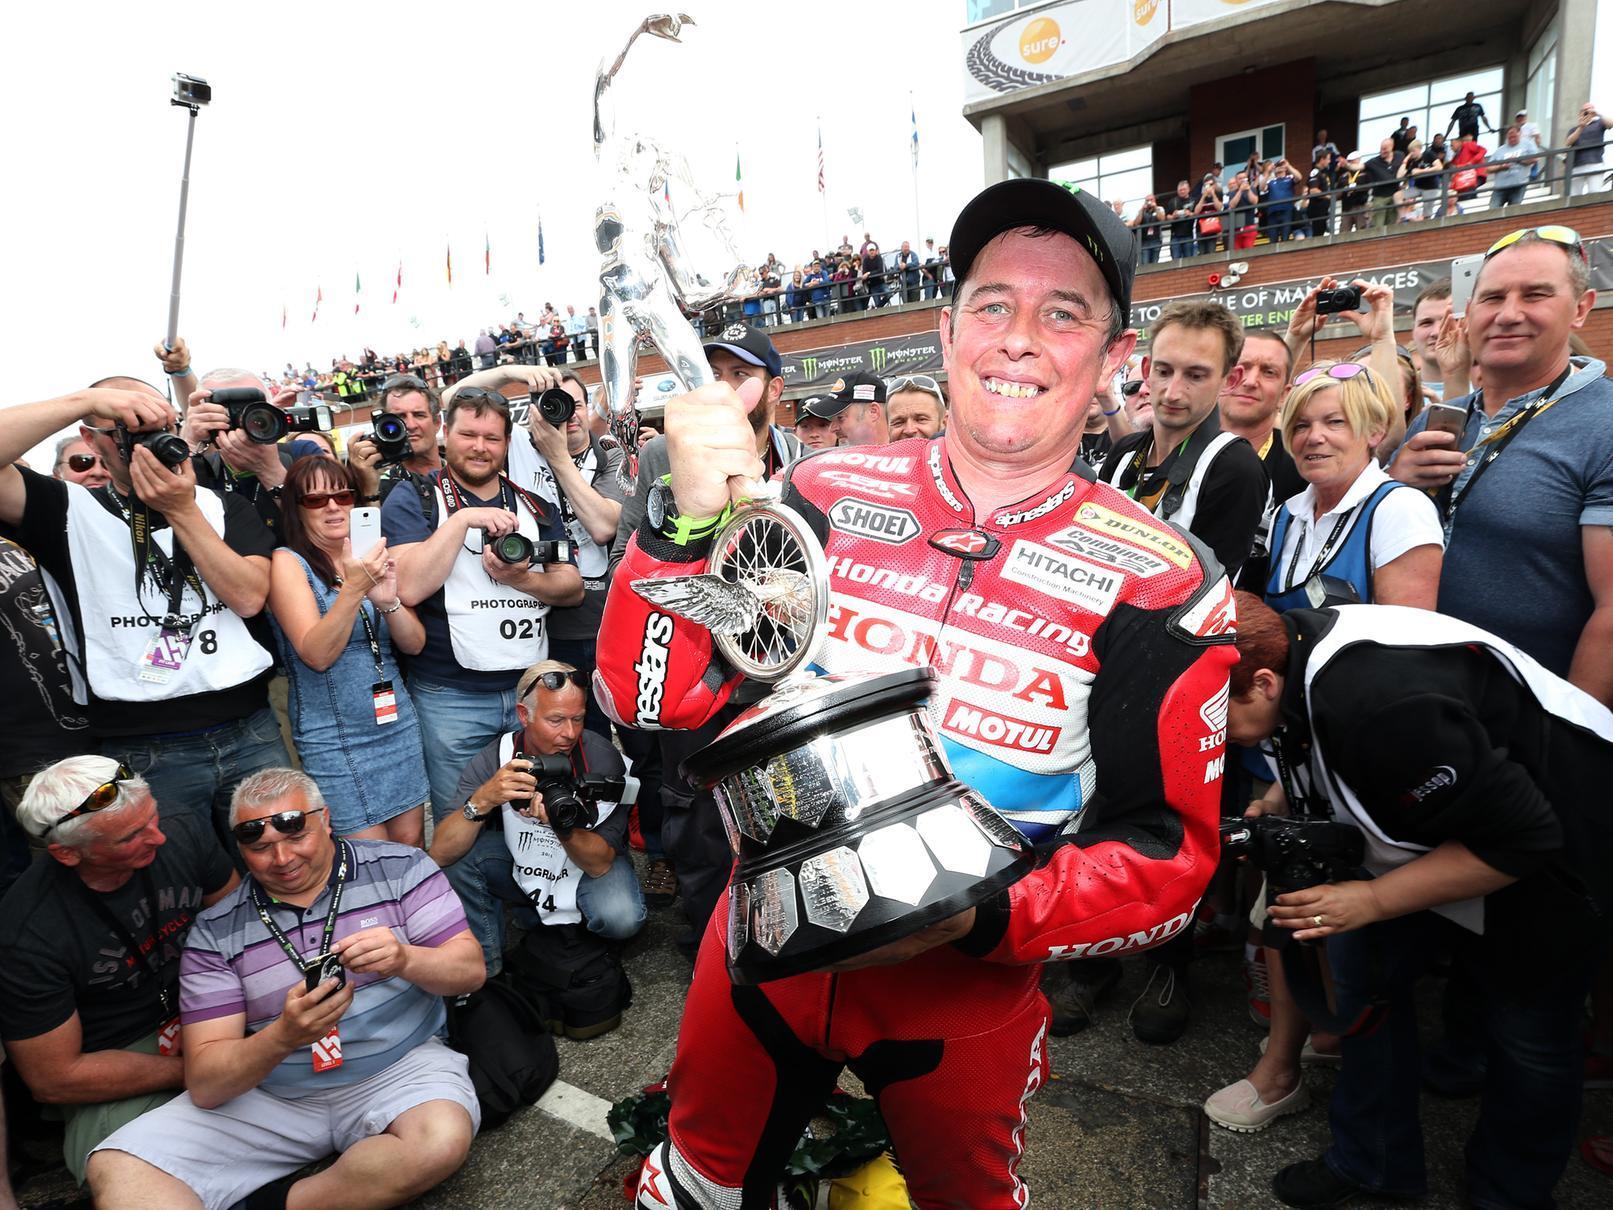 John McGuinness left 'feeling empty' following cancellation of 2021 Isle of Man TT | Belfast ...